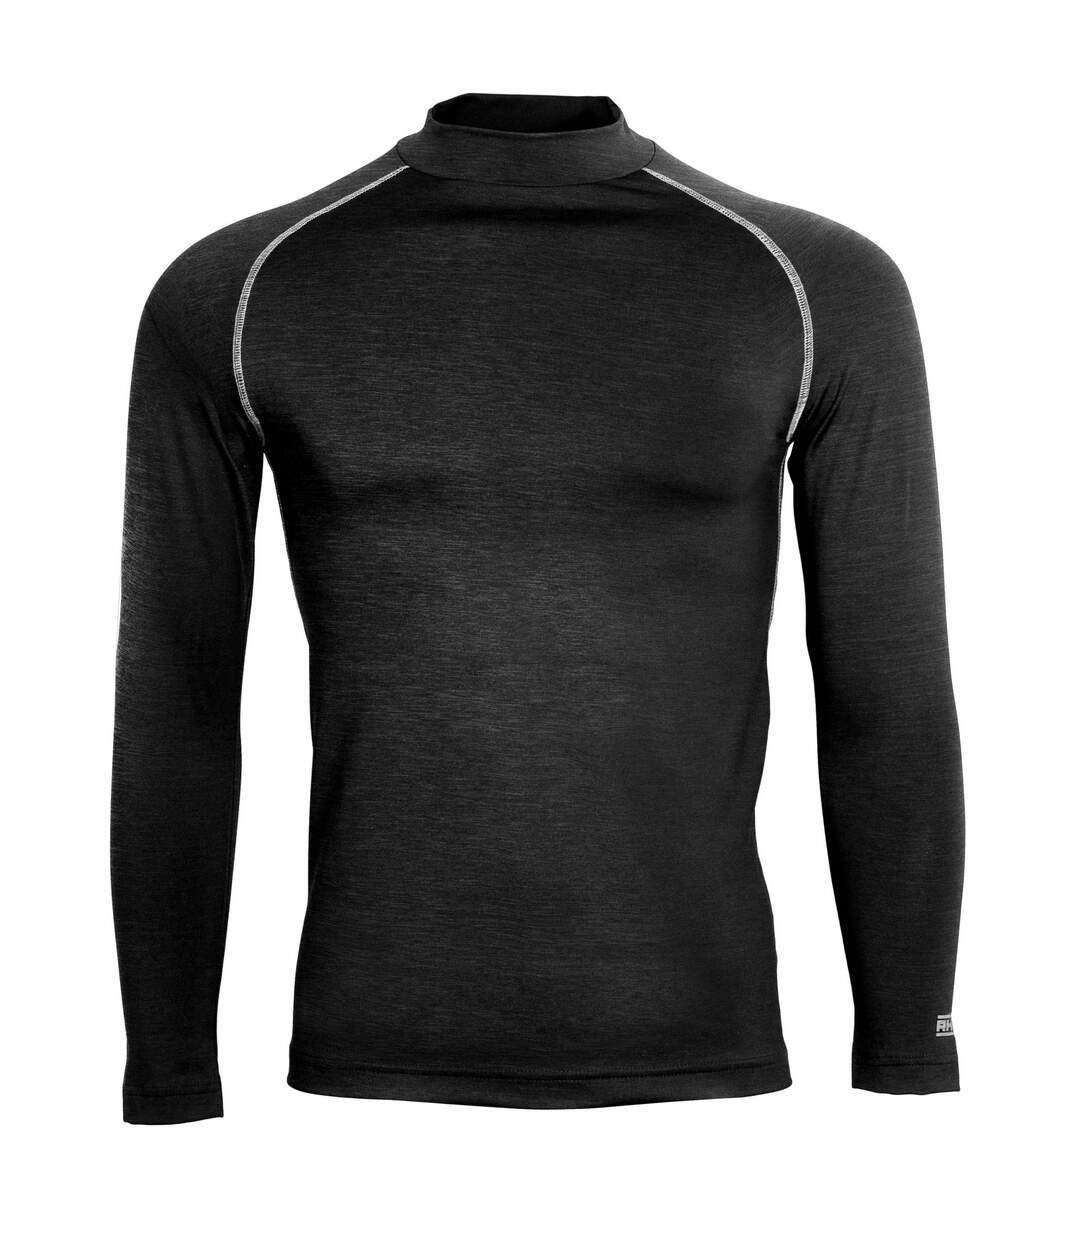 Rhino Mens Thermal Underwear Long Sleeve Base Layer Vest Top (Black Heather) - UTRW1276